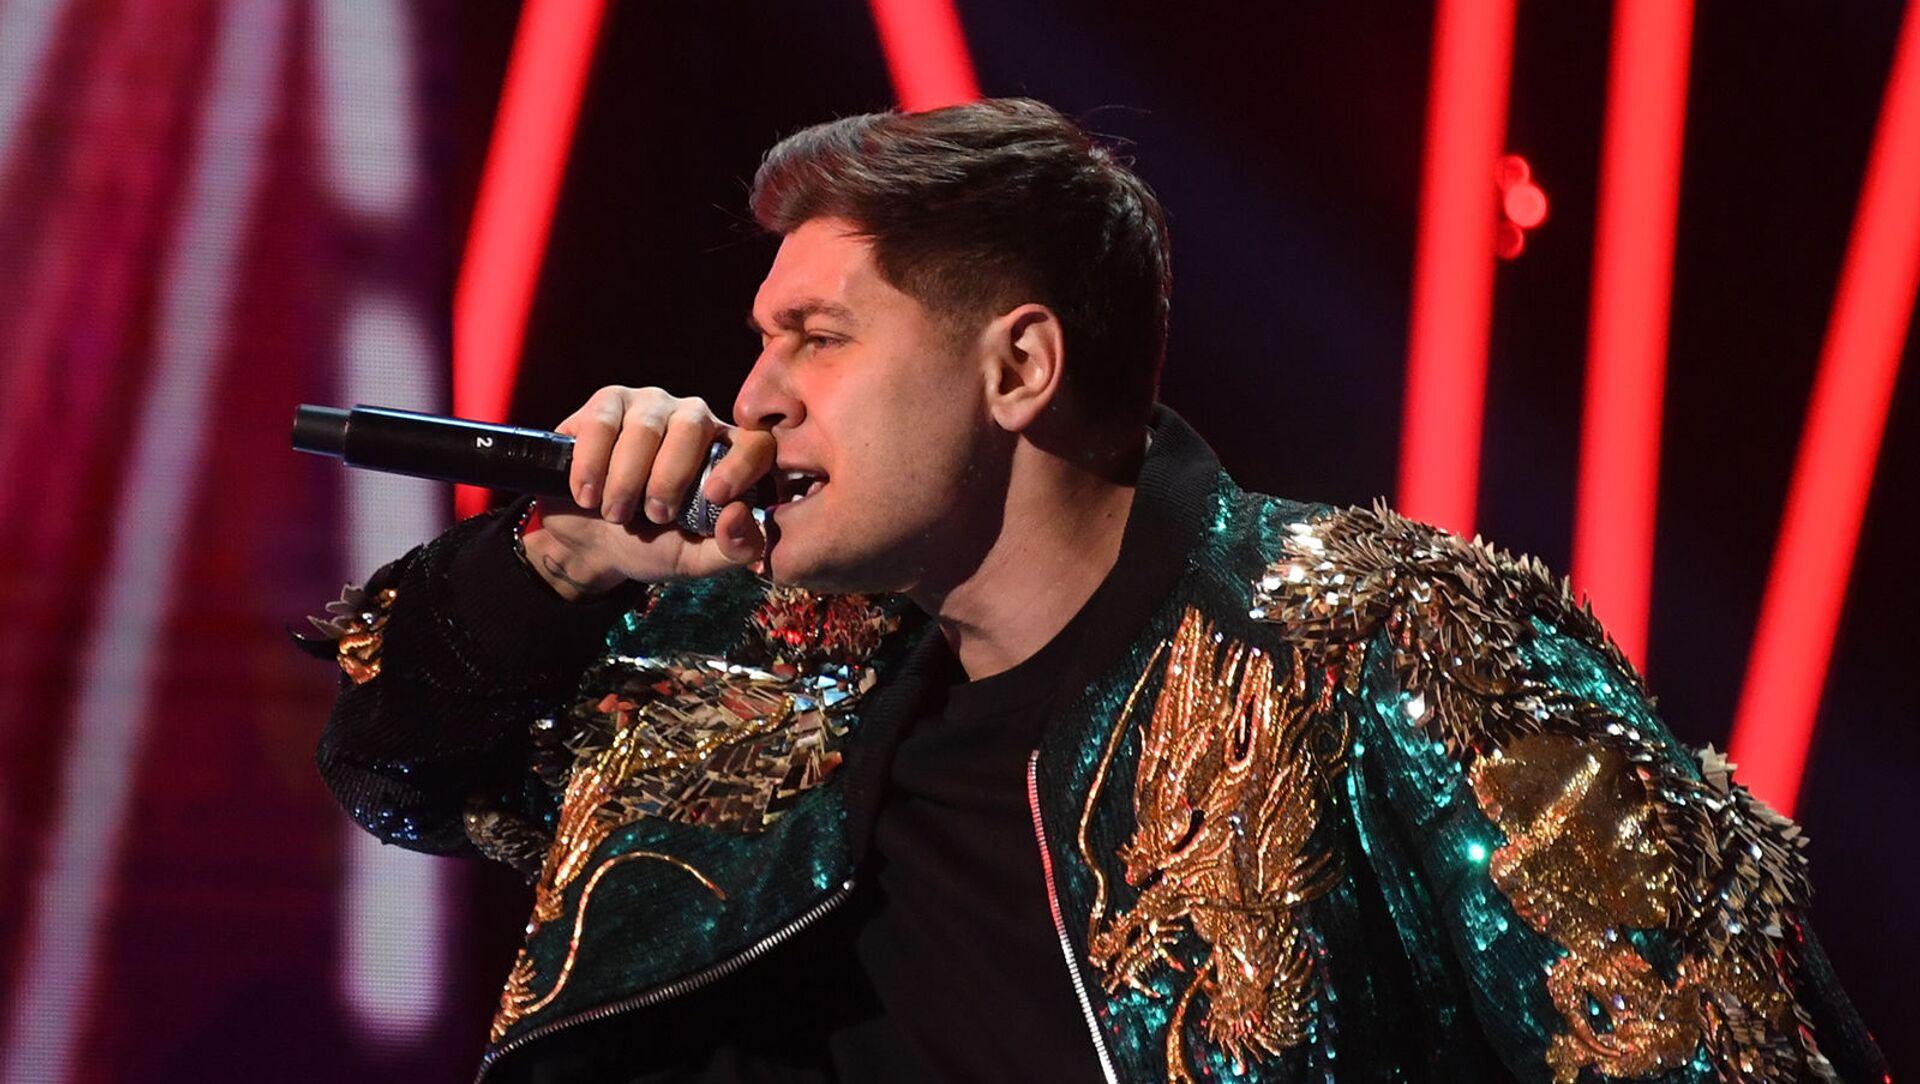 Давид Манукян (Dava) на концерте Песня года - 2020 (5 декабря 2020). Москвa - Sputnik Армения, 1920, 24.03.2021